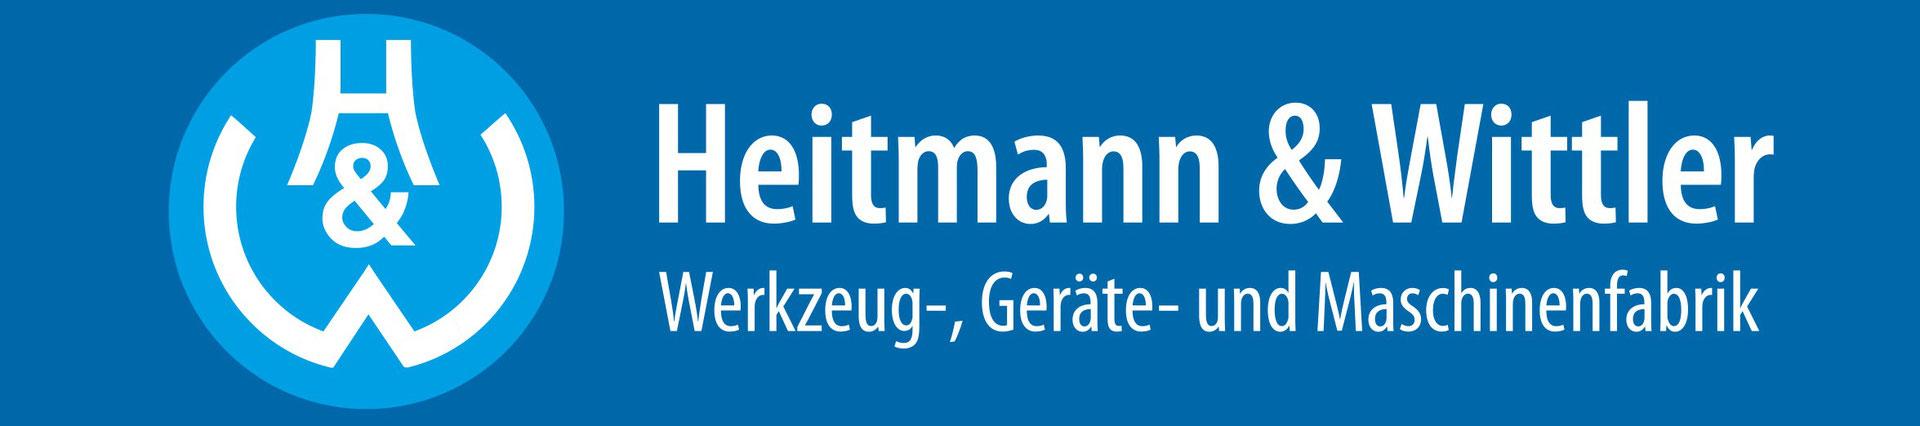 Heitmann-Wittler